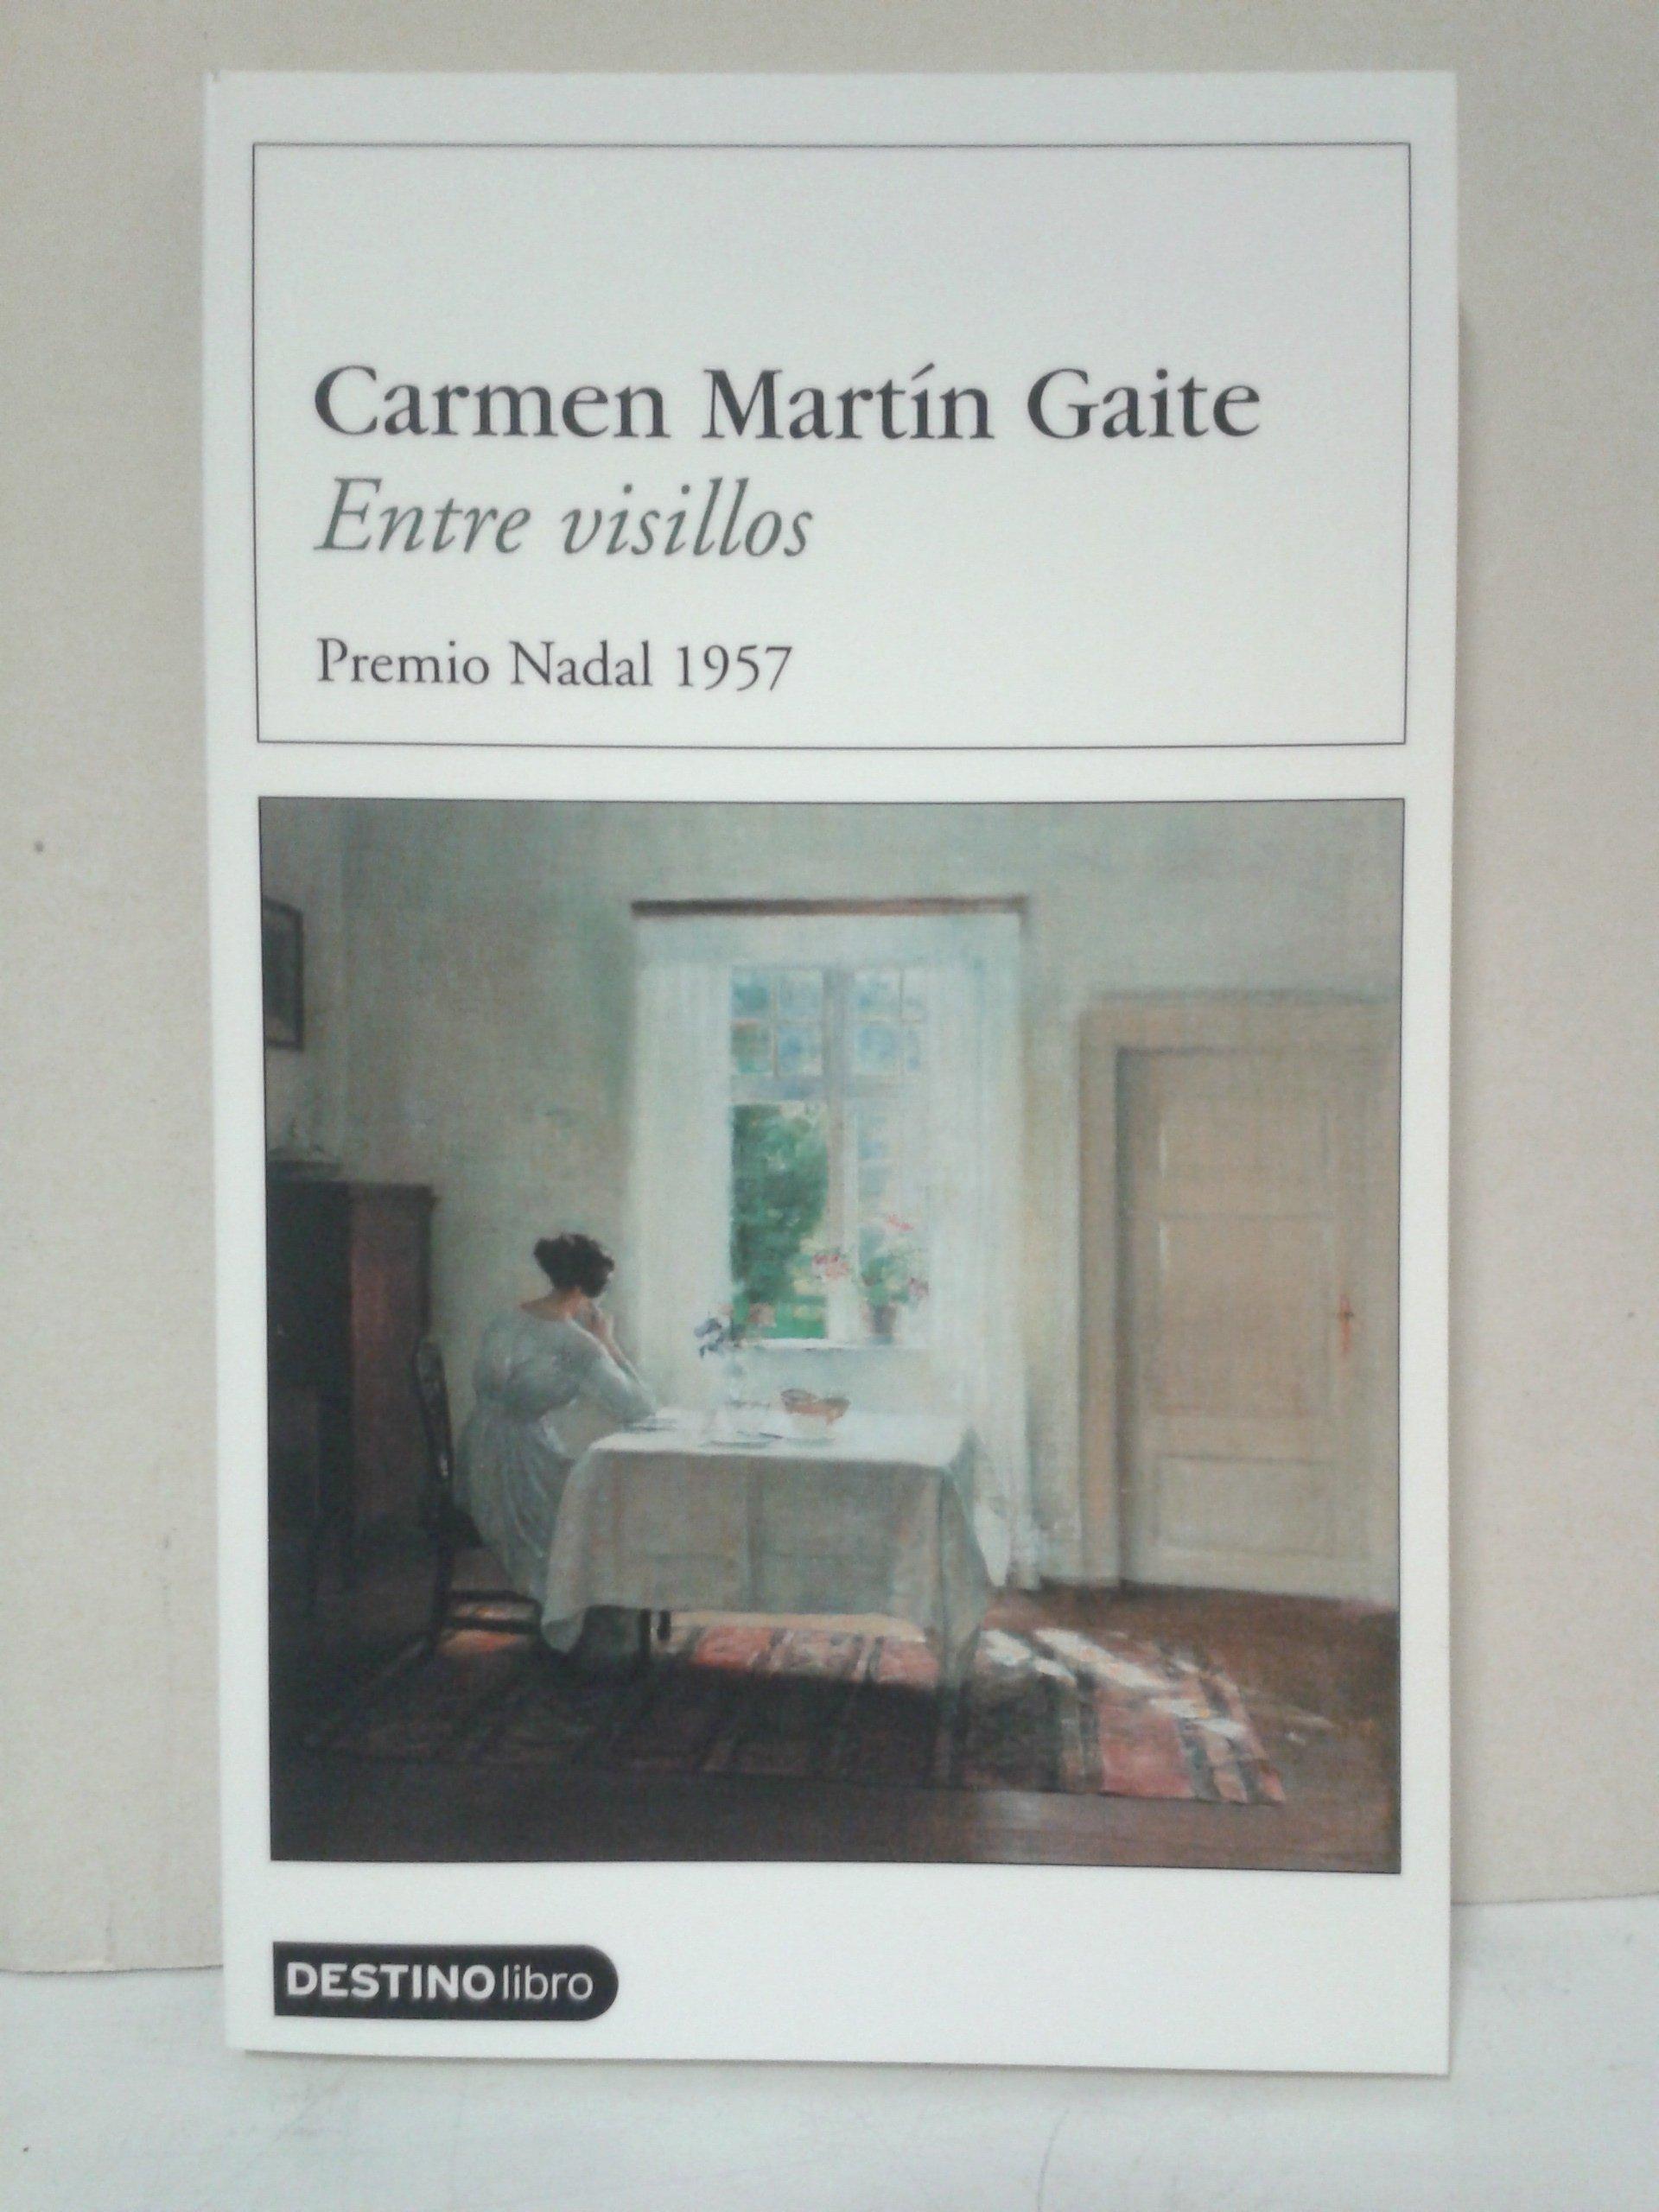 Entre visillos ((2) Destinolibro): Amazon.es: Martin Gaite, Carmen: Libros